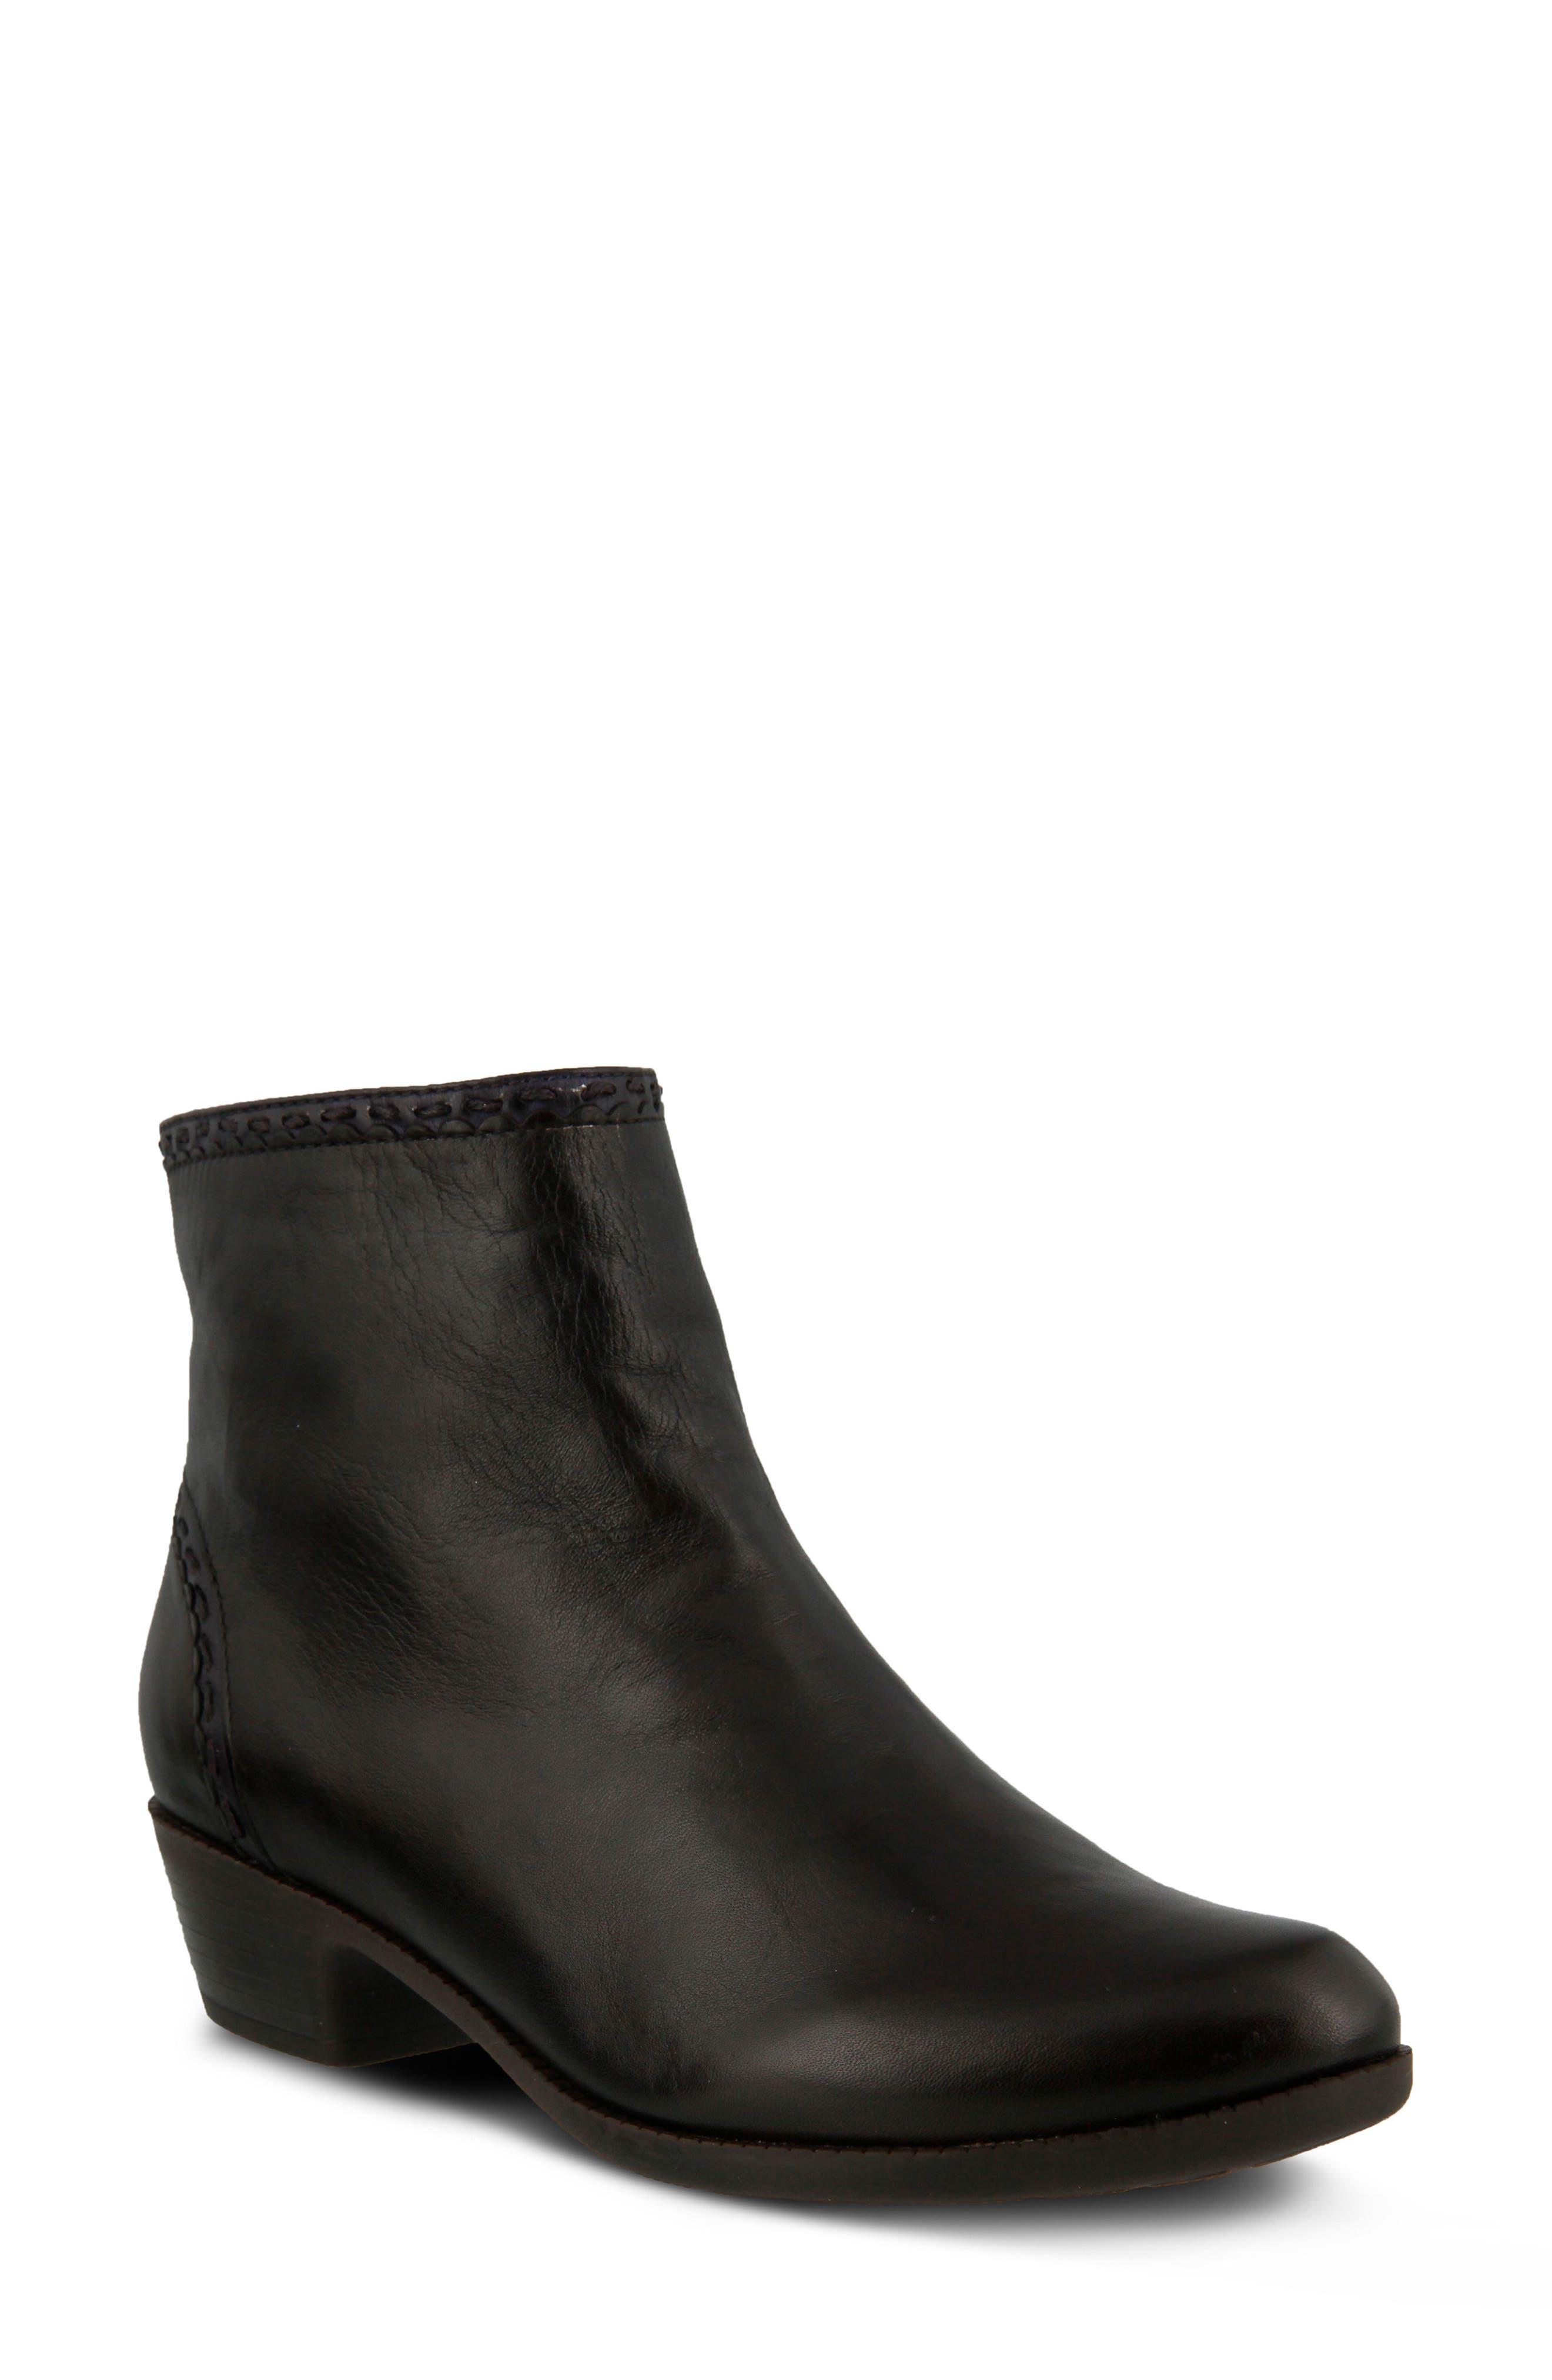 Micaela Bootie,                         Main,                         color, Dark Brown Leather